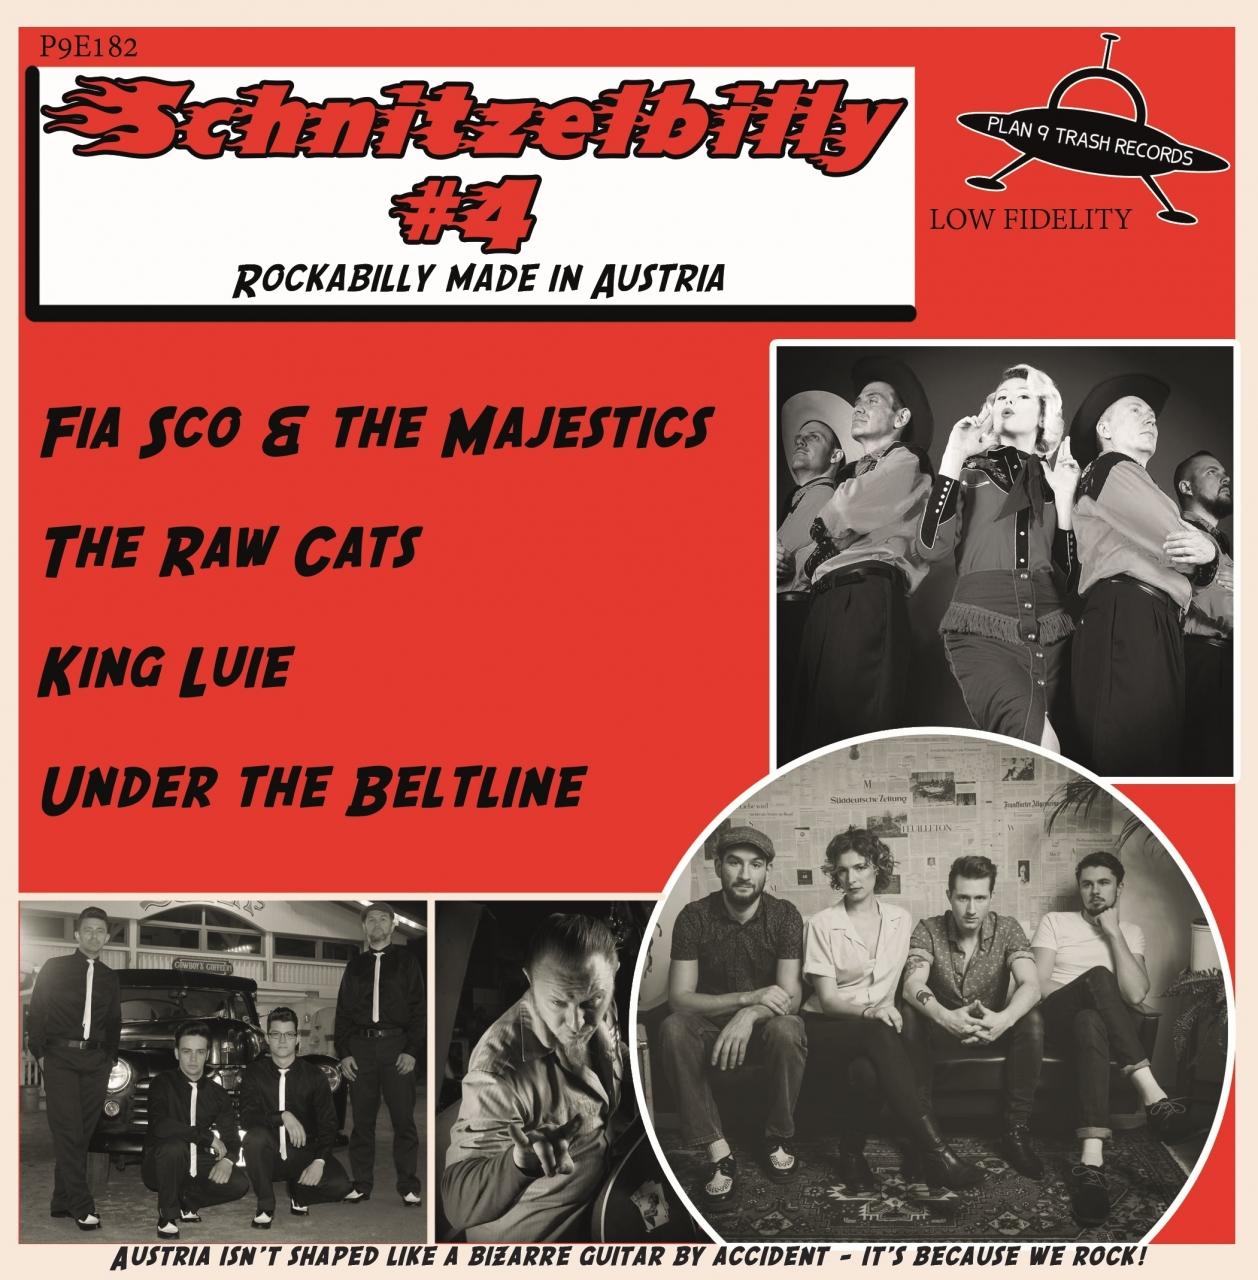 P9E182_VA_Schnitzelbilly Vol. IV_7 inch Vinyl EP